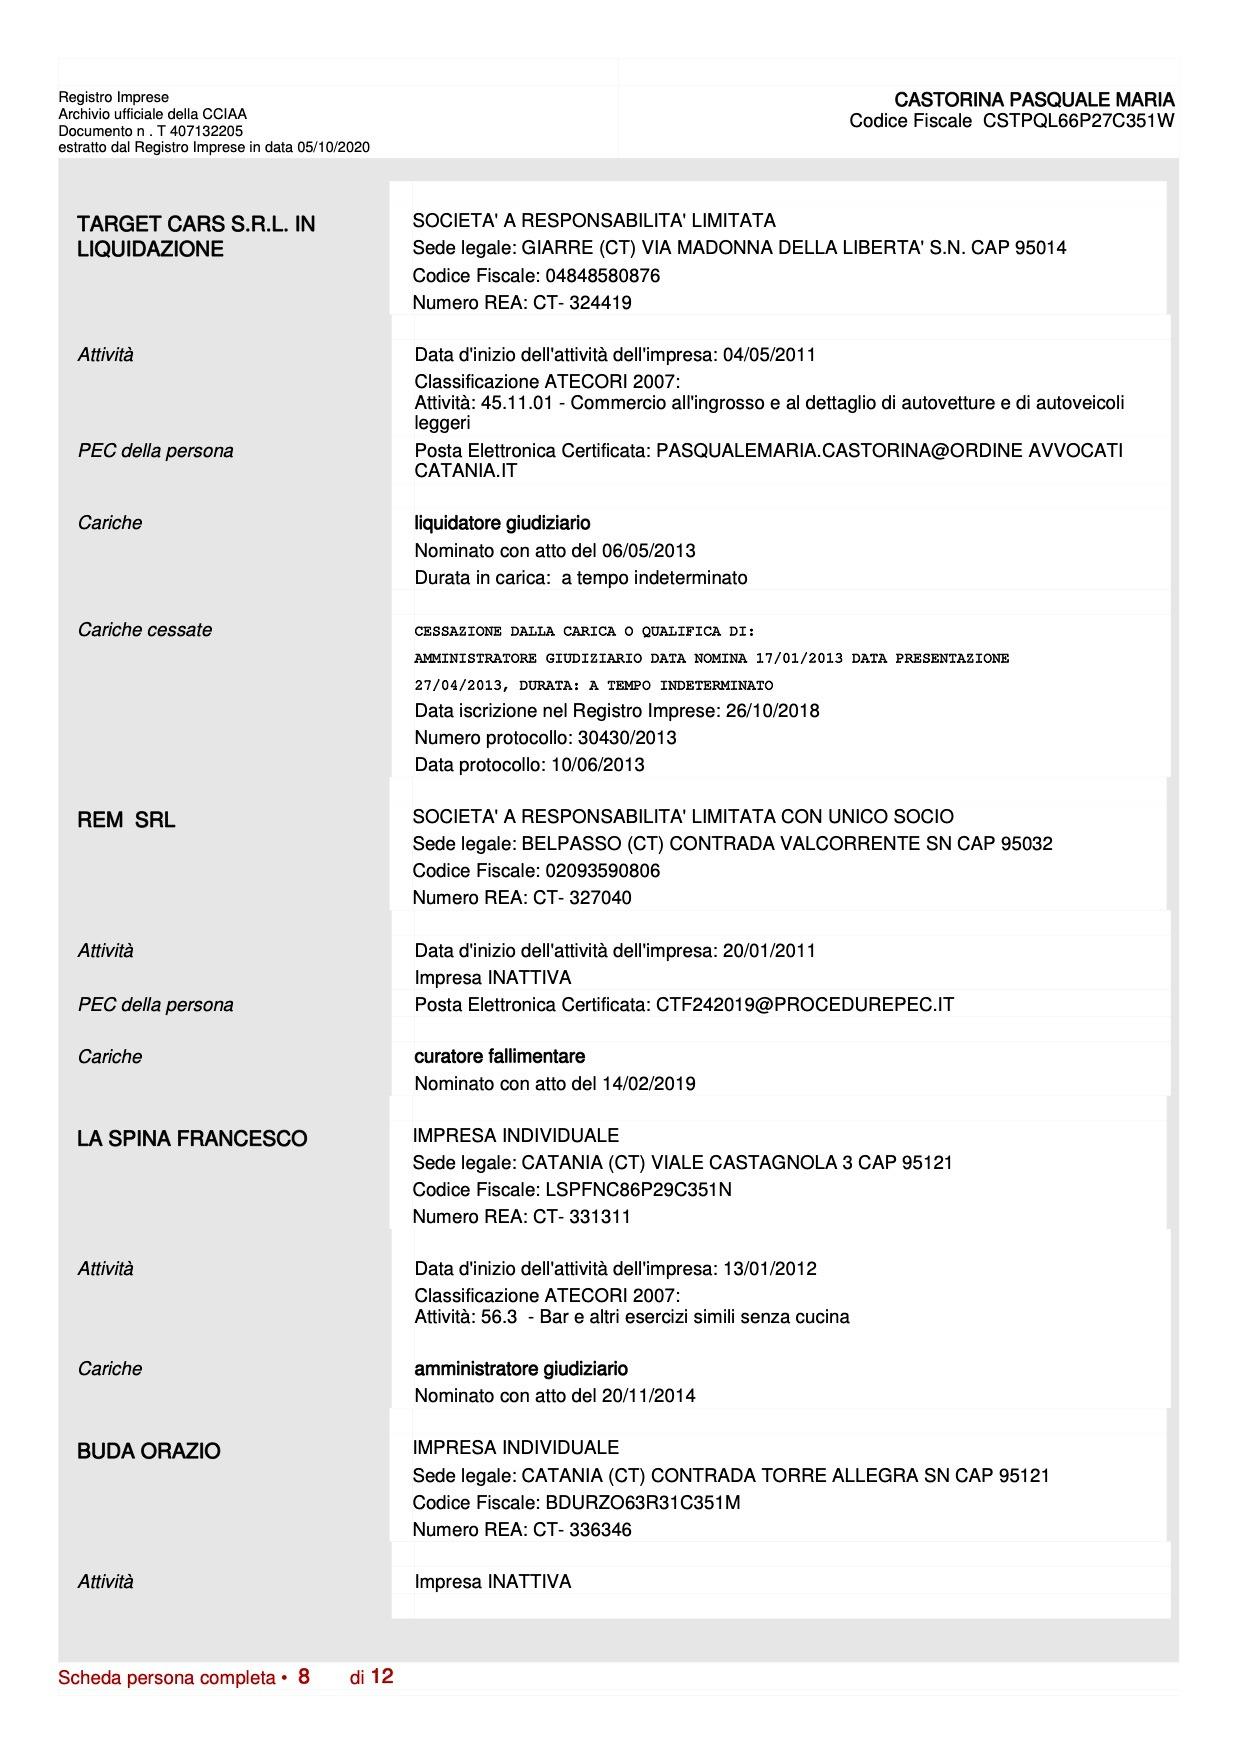 castorinapasquale8-1603401289.jpg